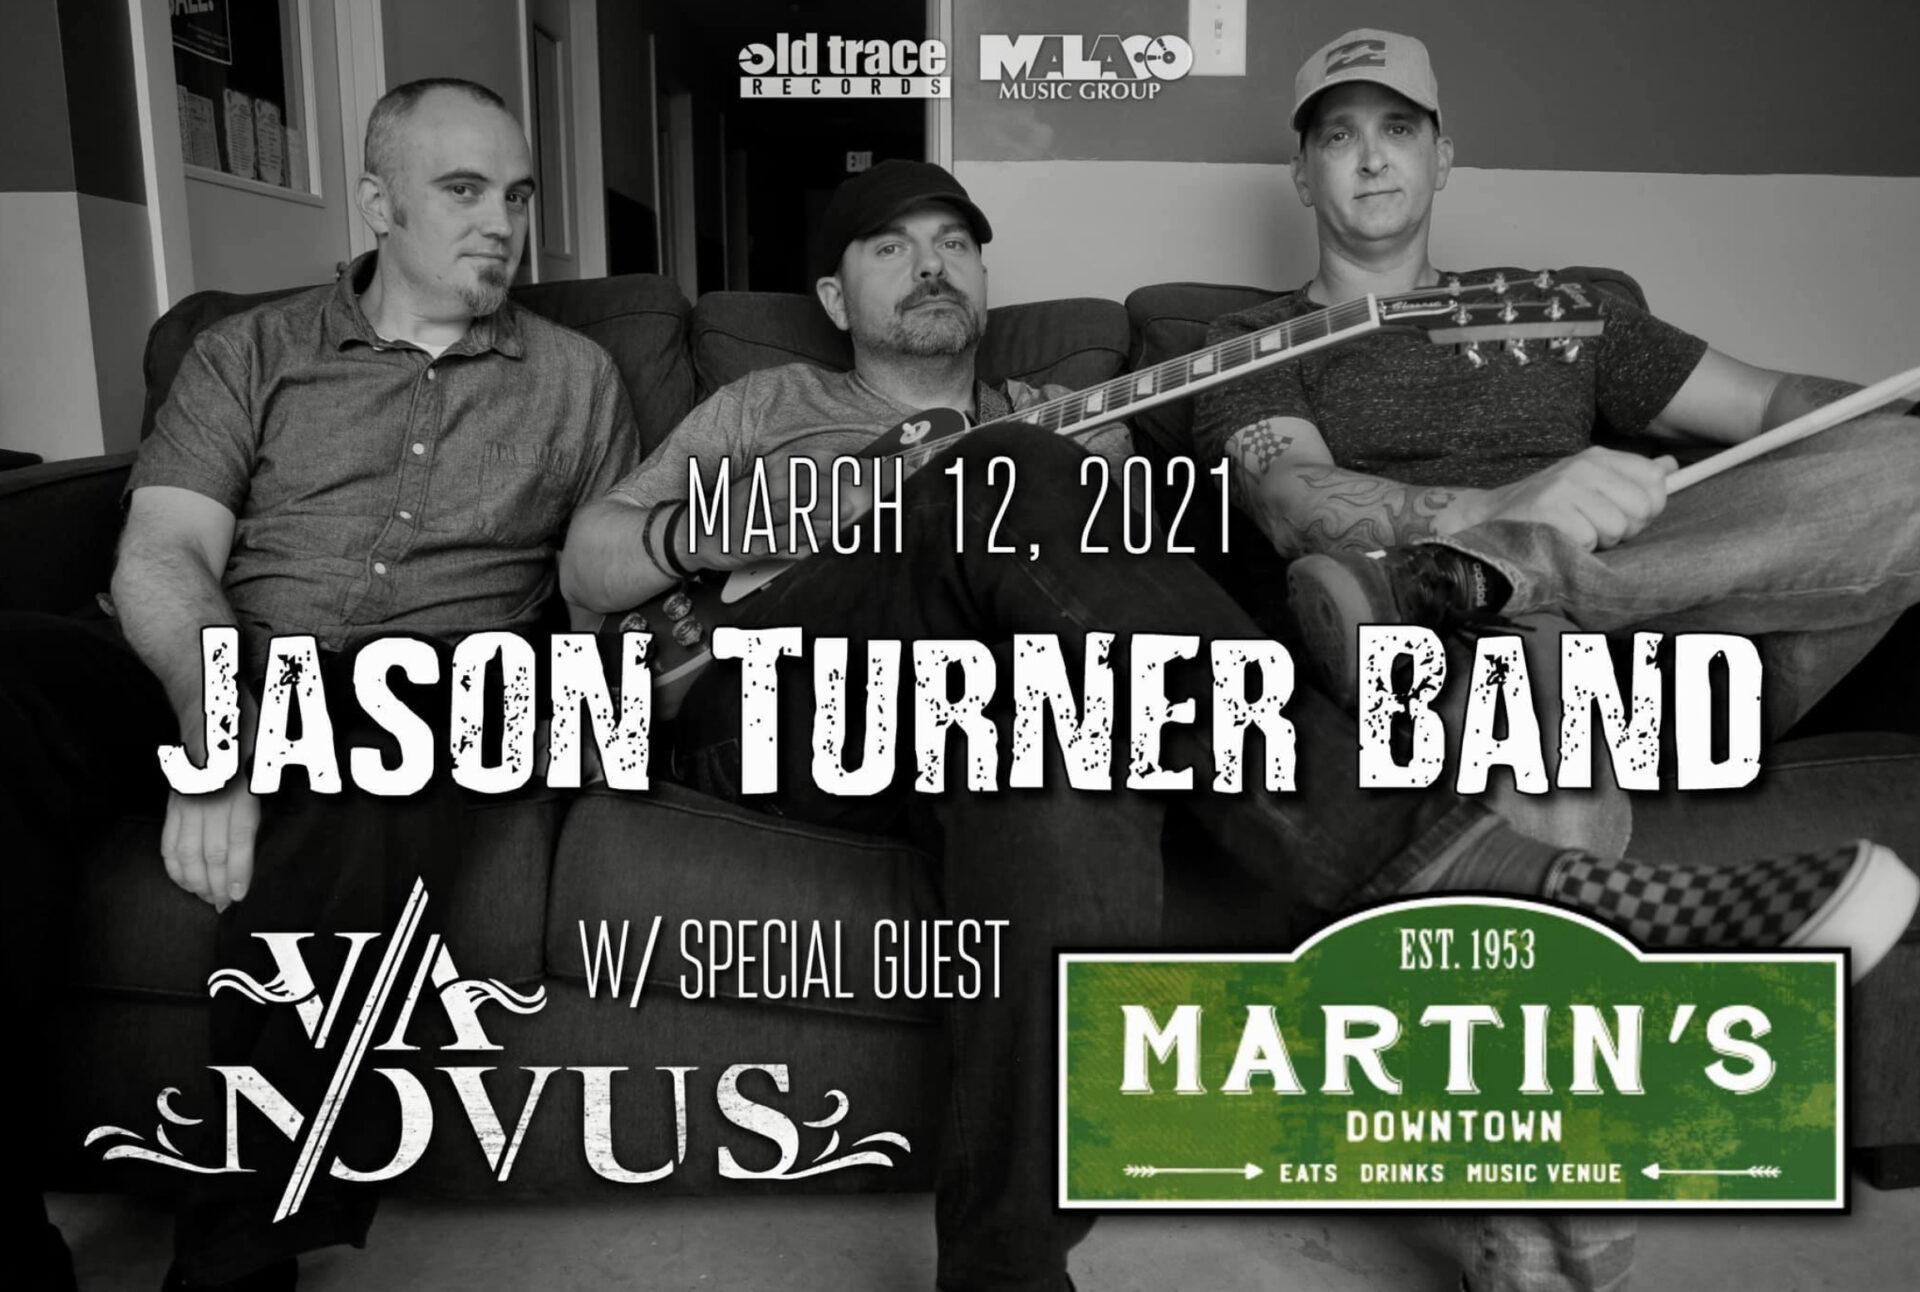 Jason Turner Band at Martin's Downtown w/ Via Novus